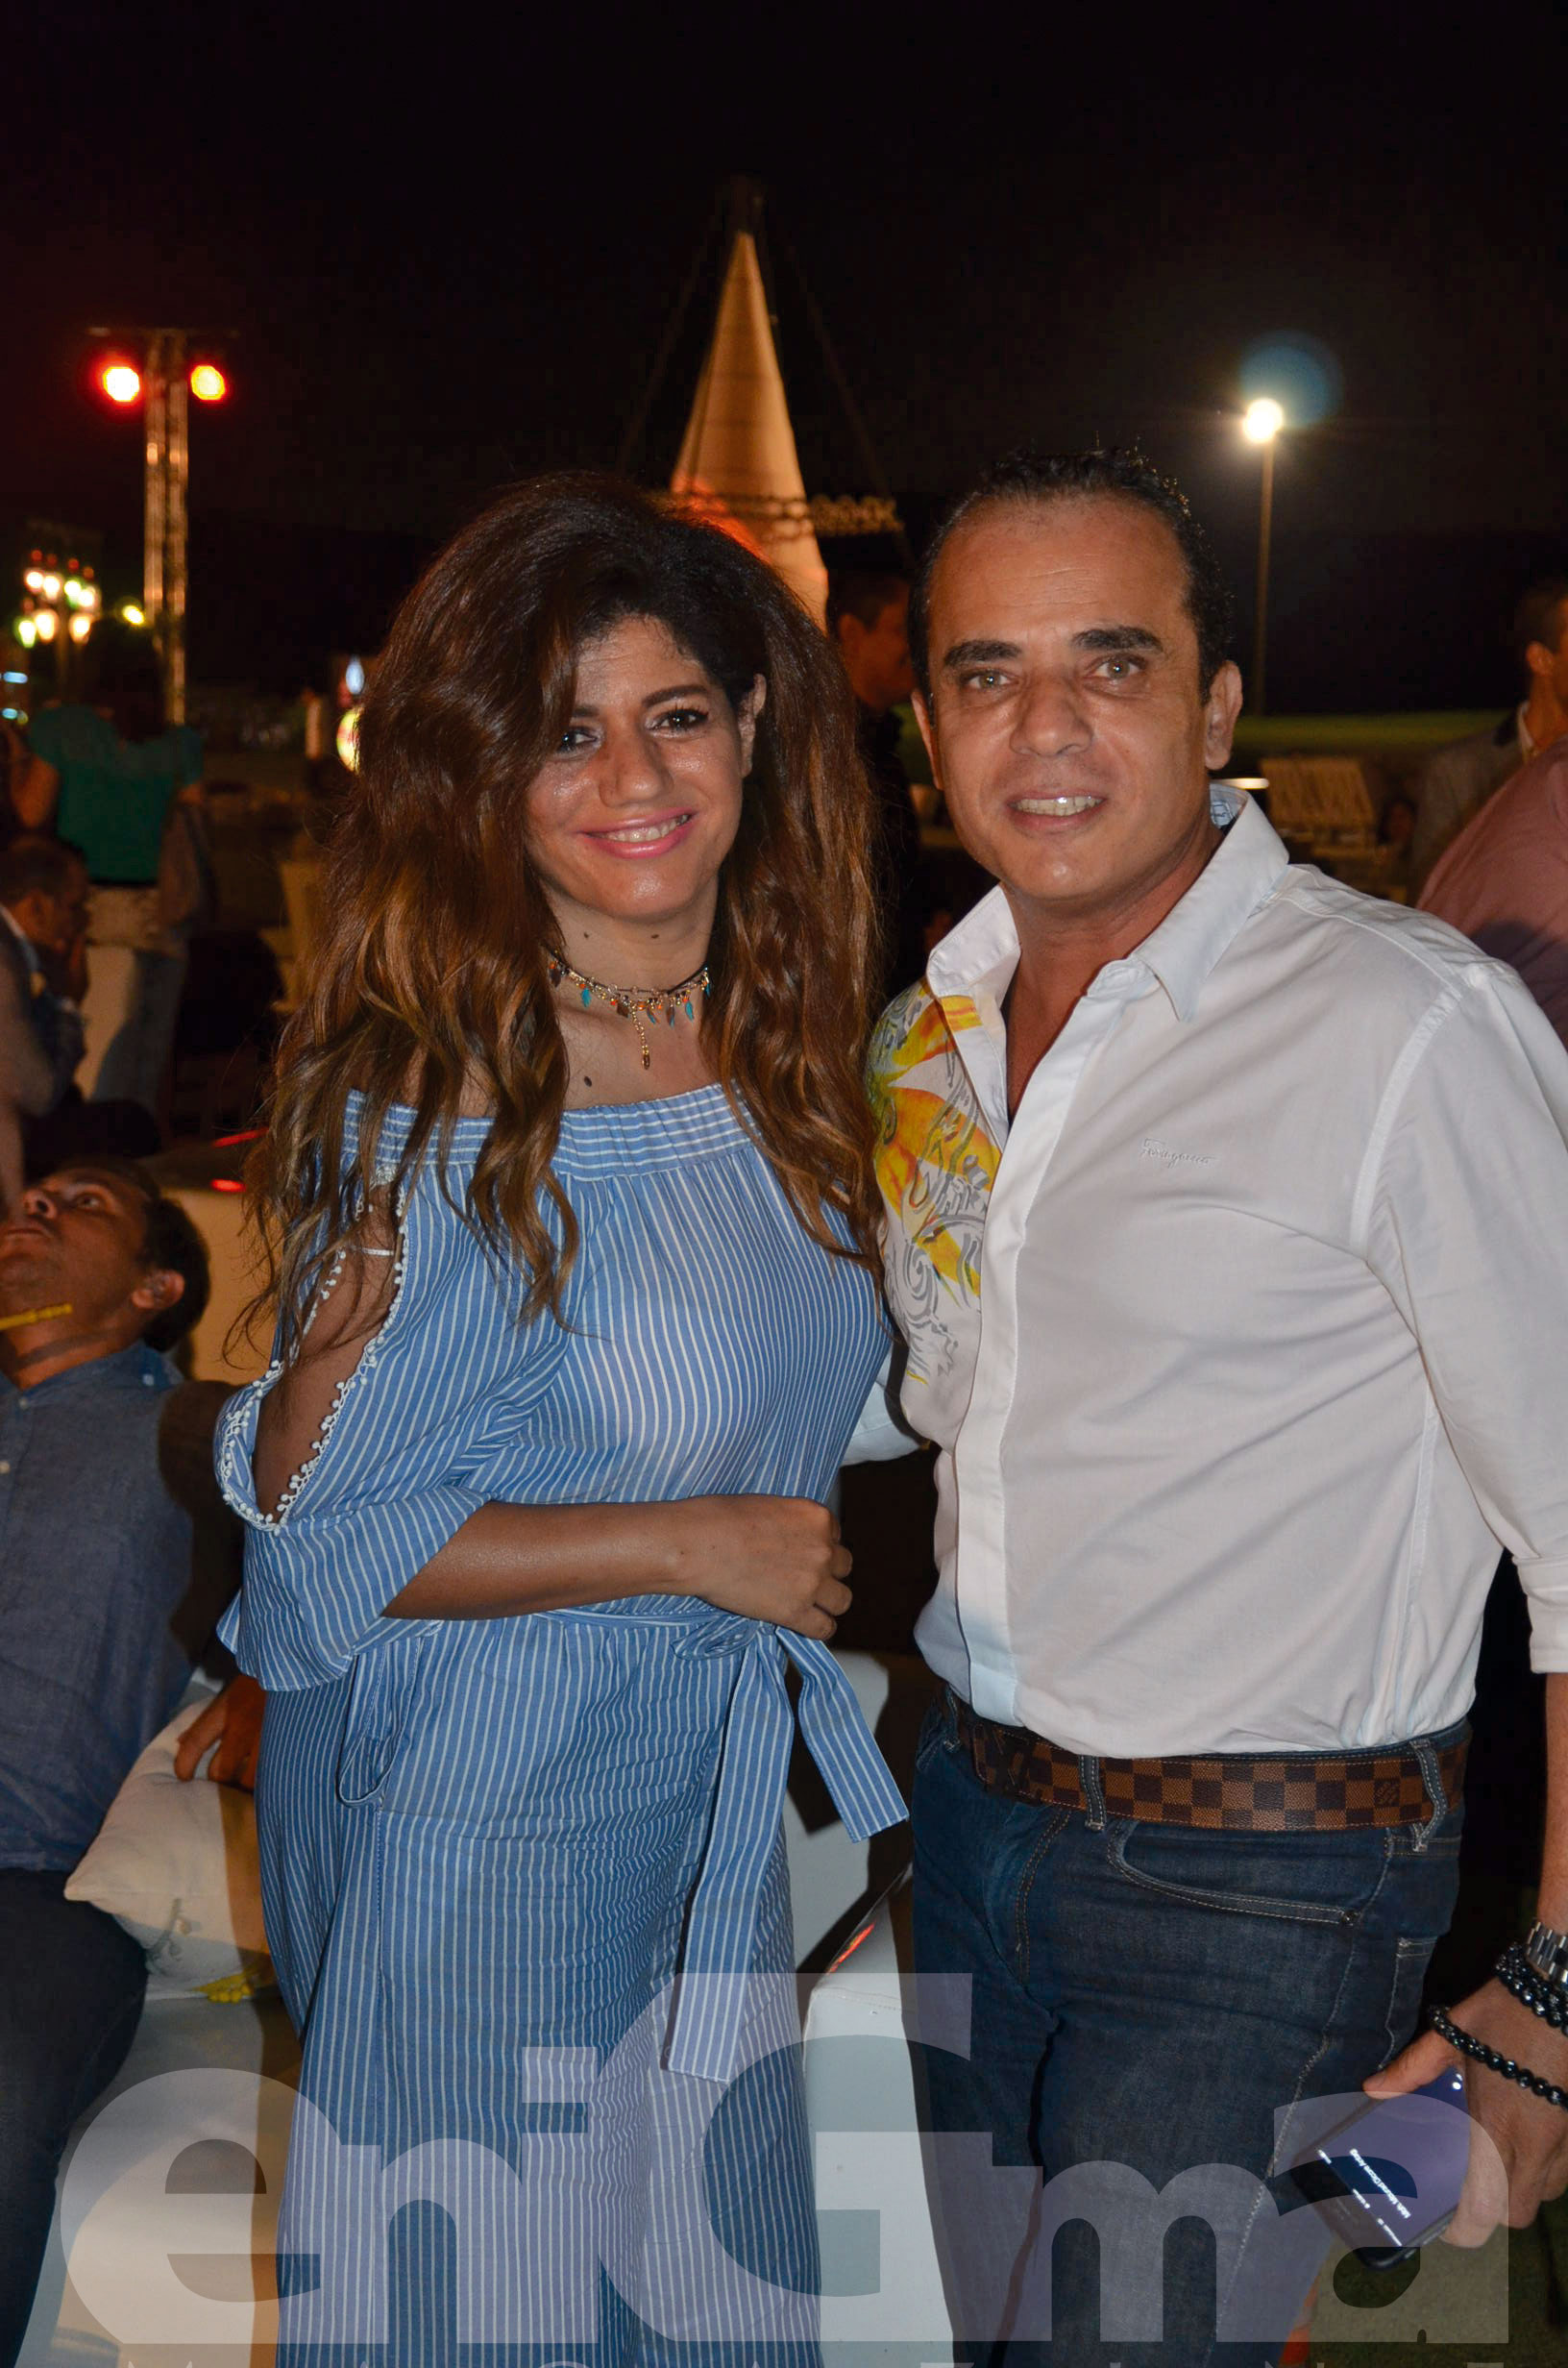 Ms.-Niveen-Hakim-&-Mohamed-El-Shakankeri-